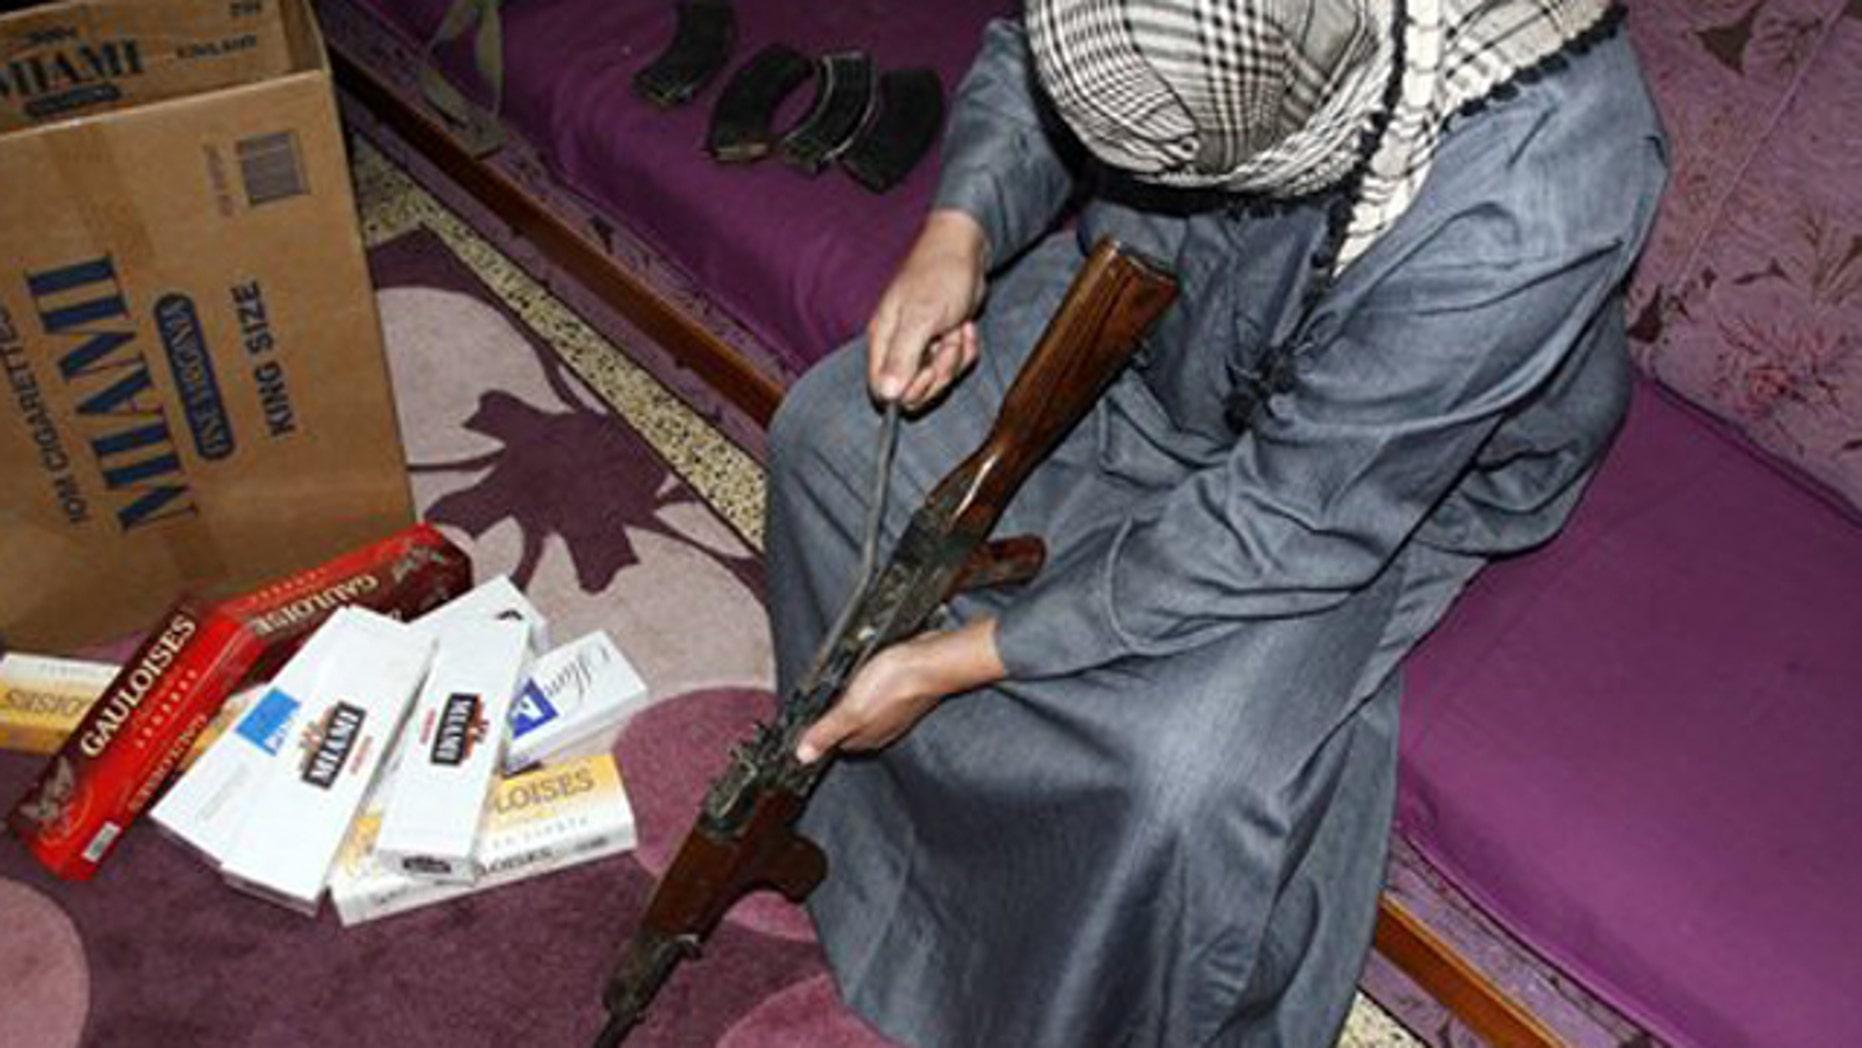 Feb. 14, 2012: Iraqi smuggler Younis al-Lehaibi, 46, dismantles an AK-47 machine-gun at his house.